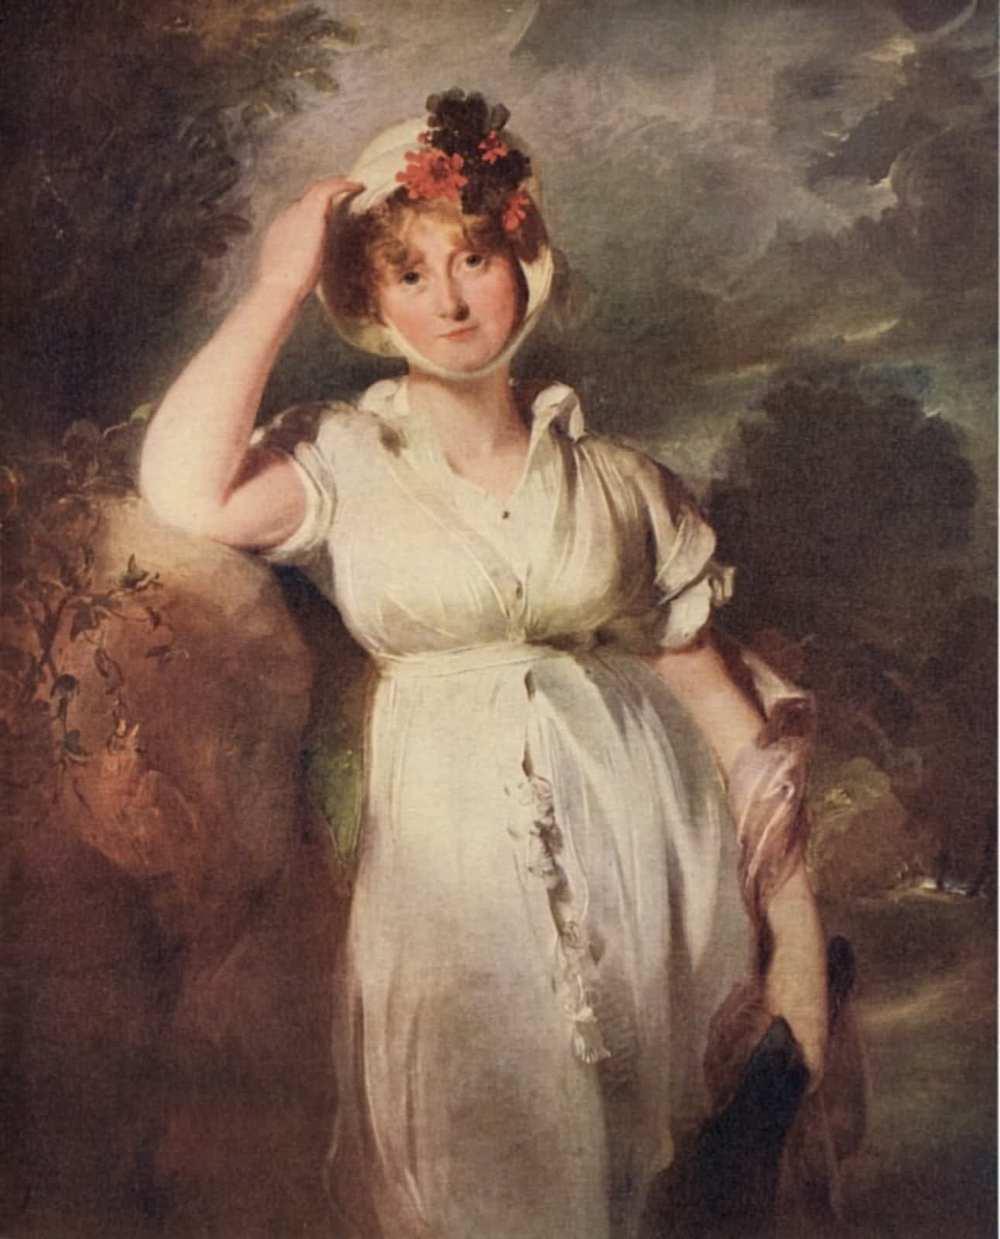 Princess Caroline of Brunswick, Princess of Wales